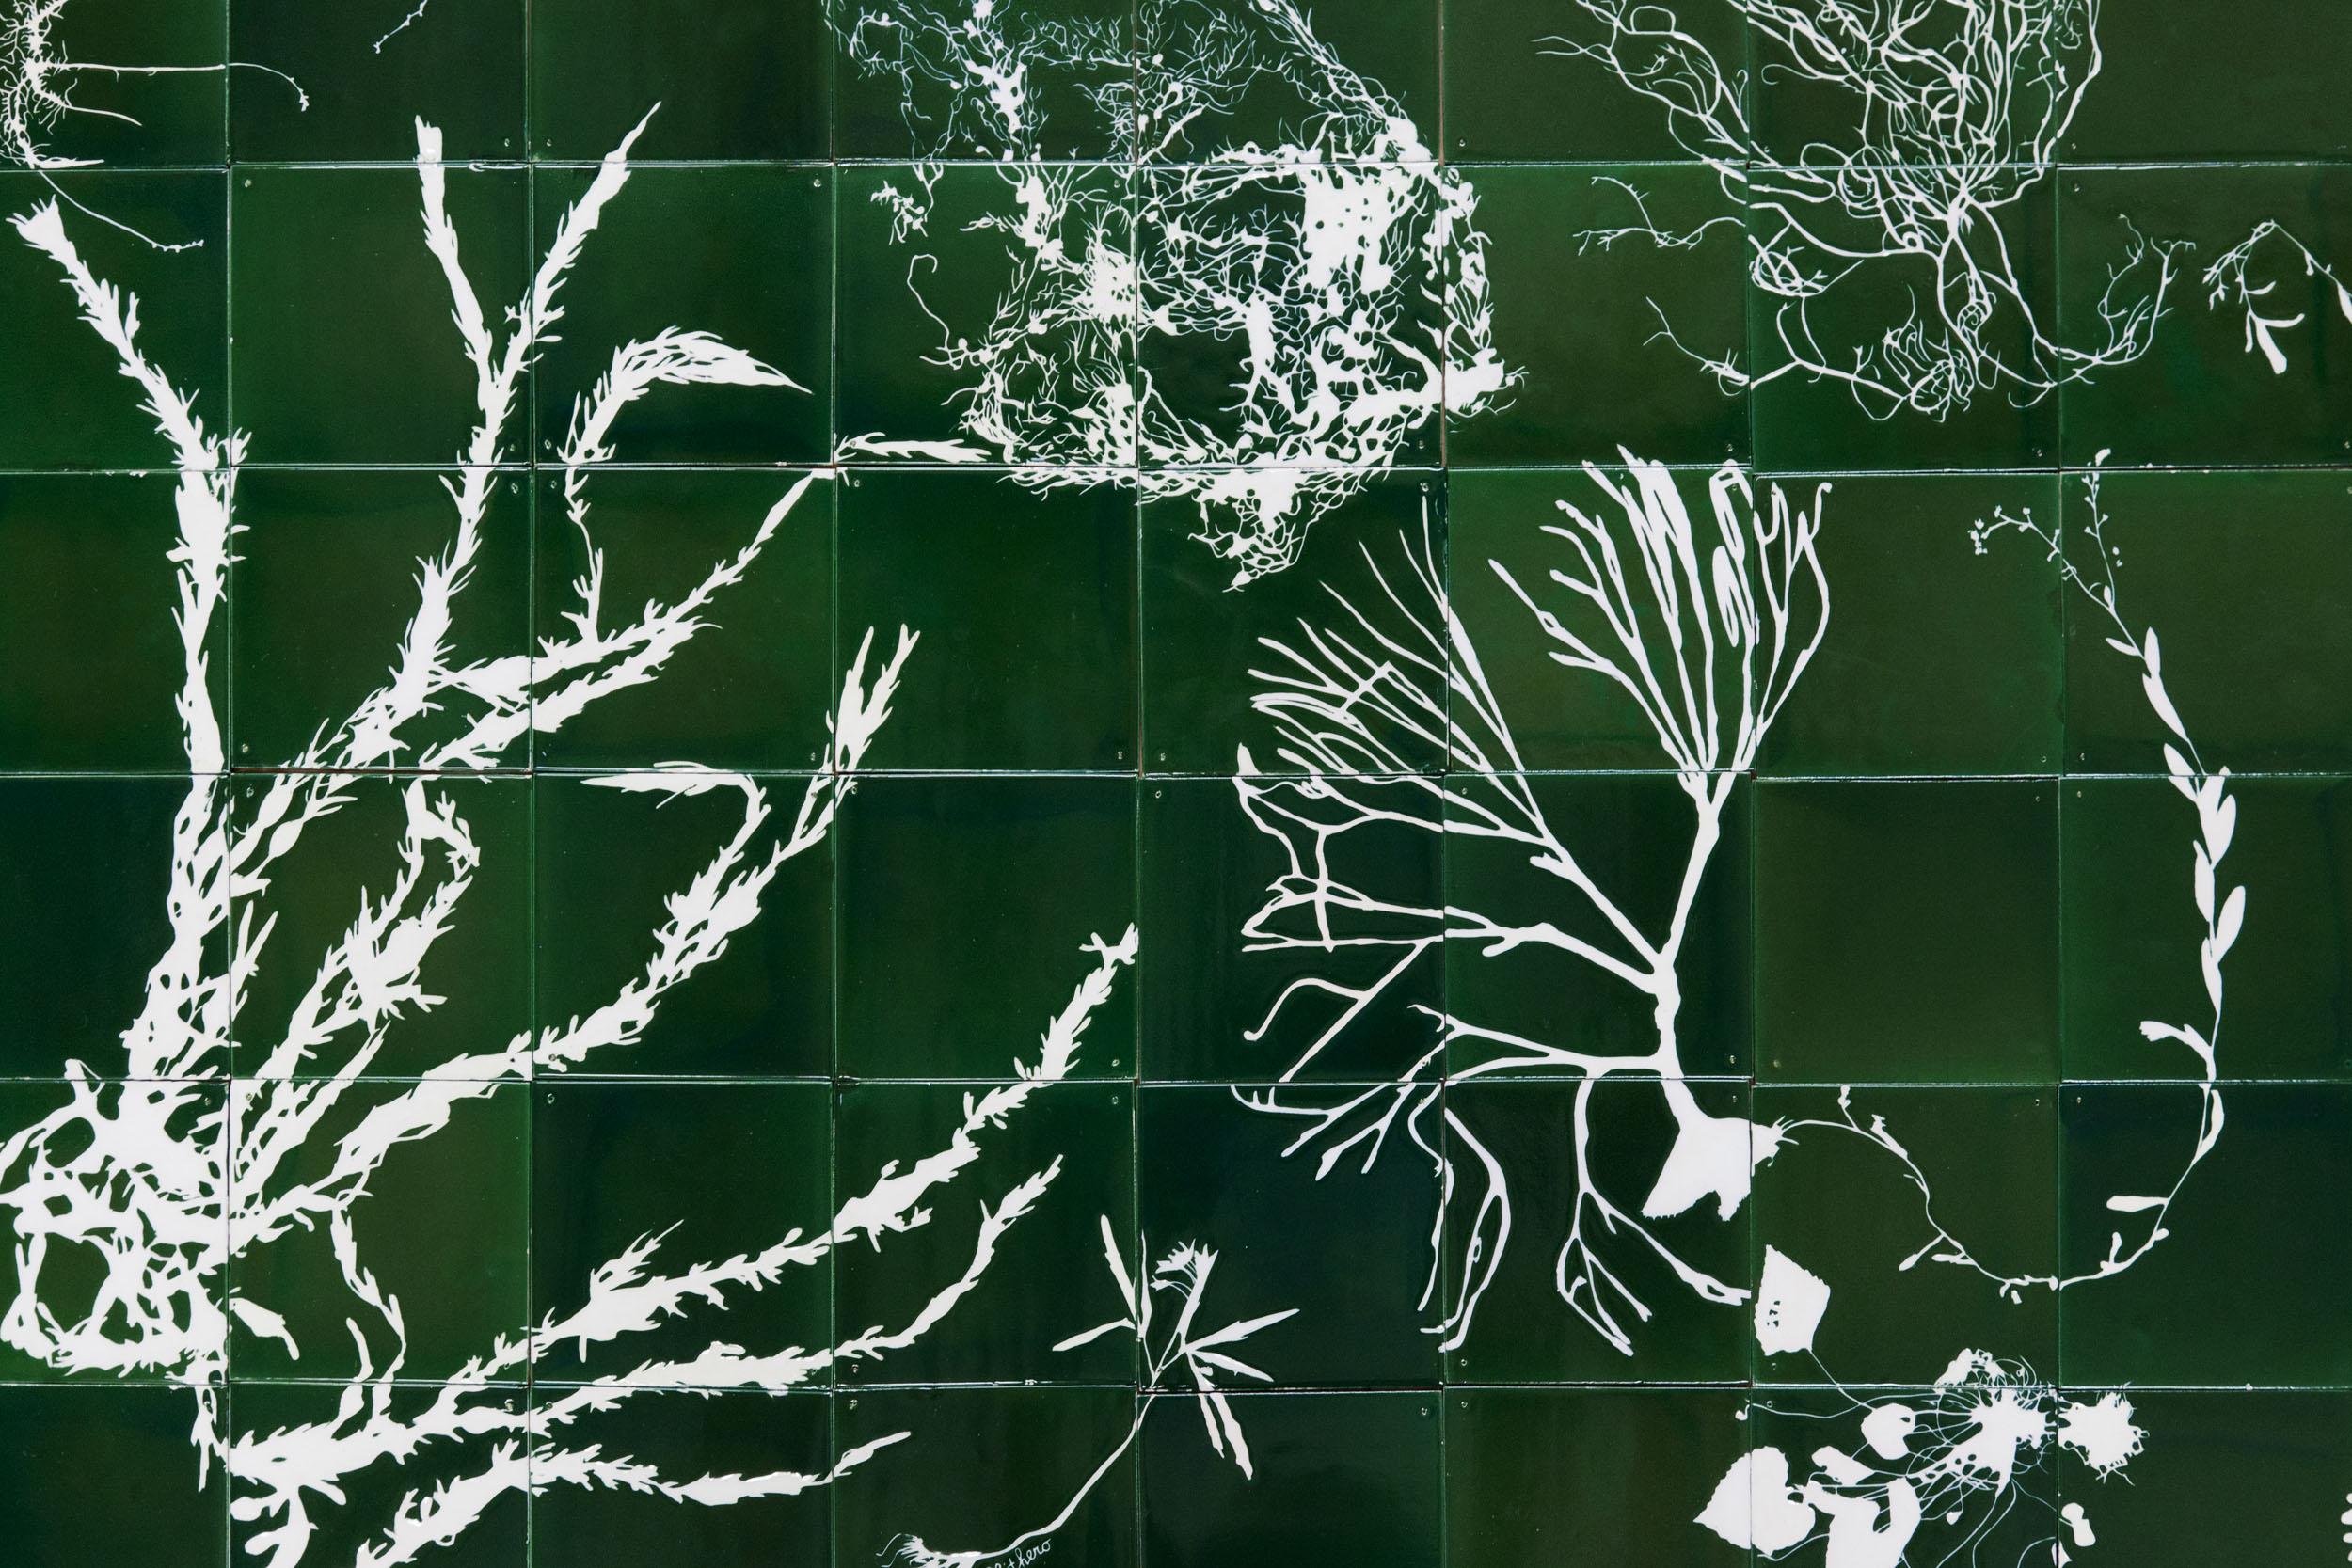 Green Botanical Tiles with sgraffito seaweed design